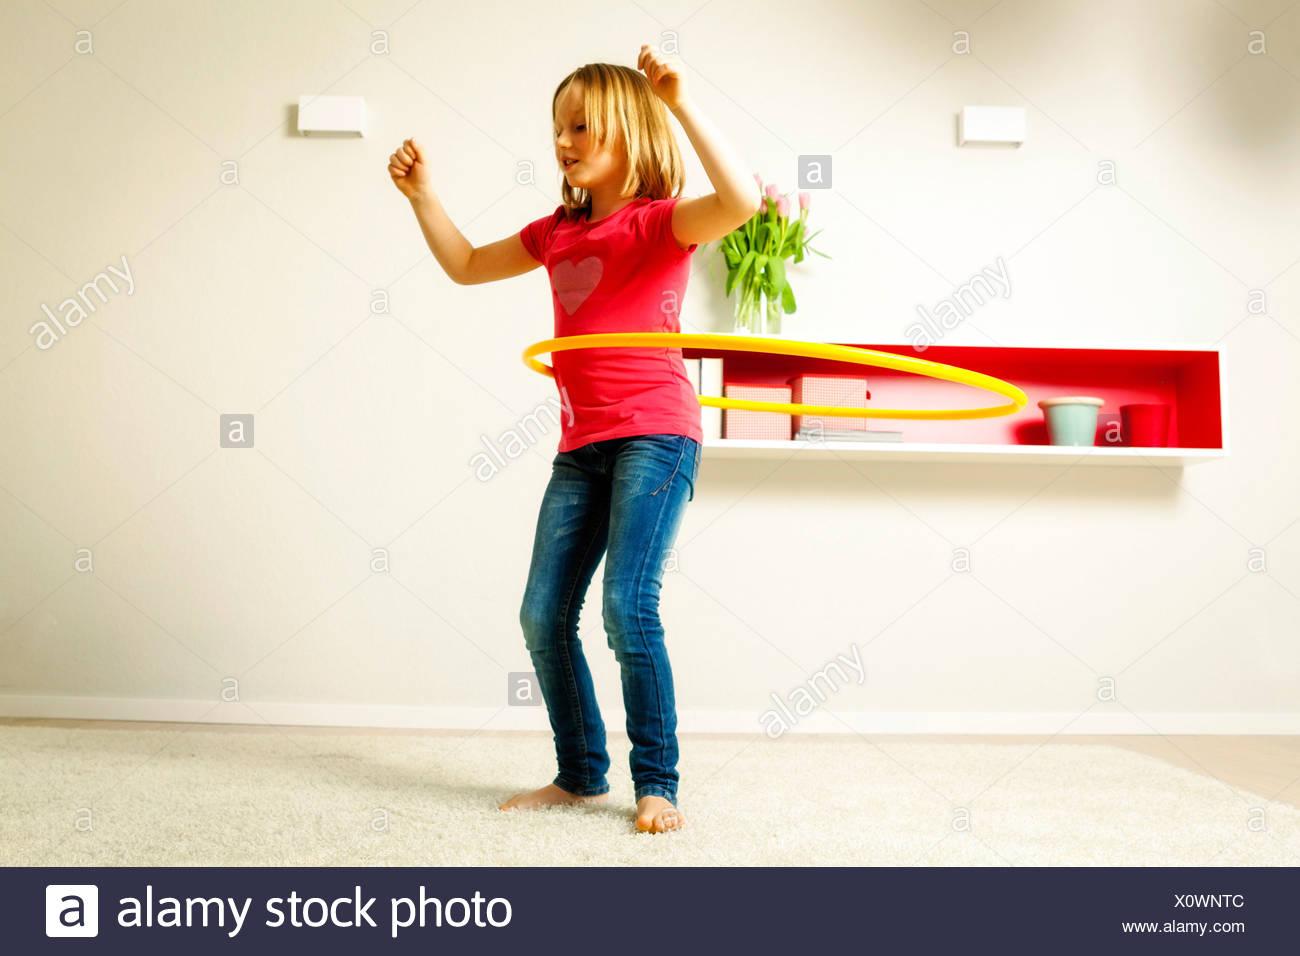 Girl using hula hoop in living room, Munich, Bavaria, Germany - Stock Image